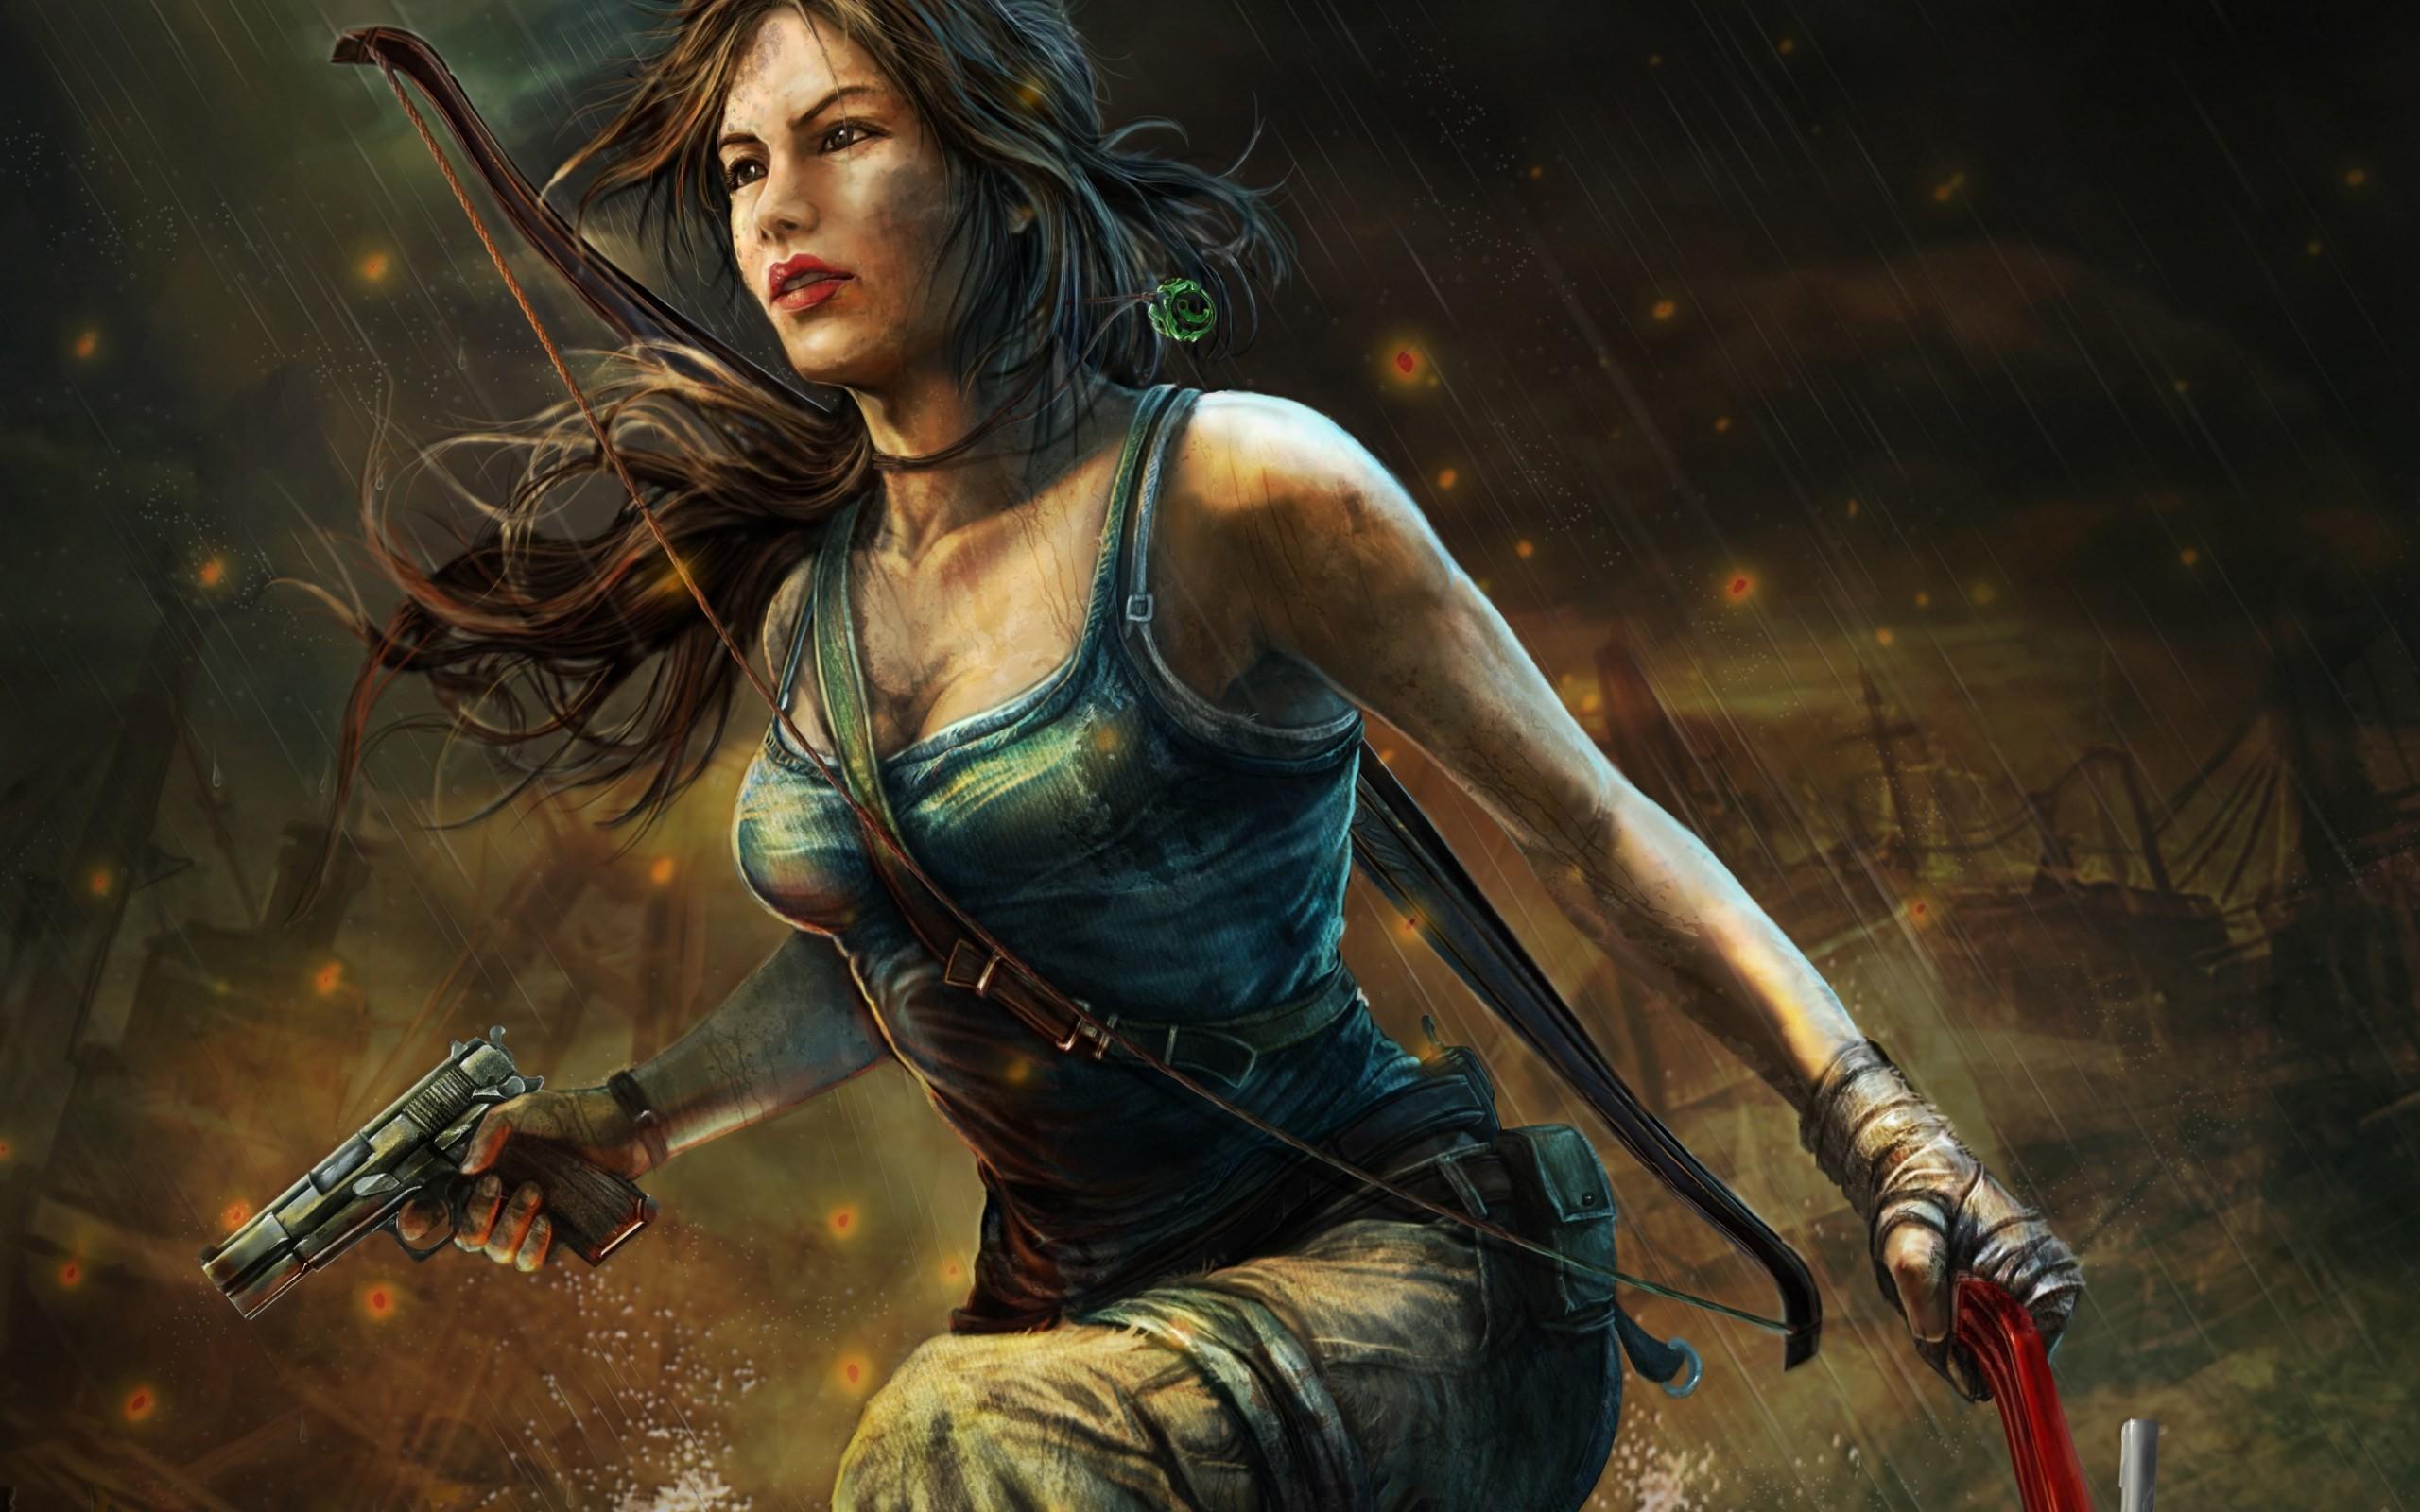 Tomb Raider Girl Game Art